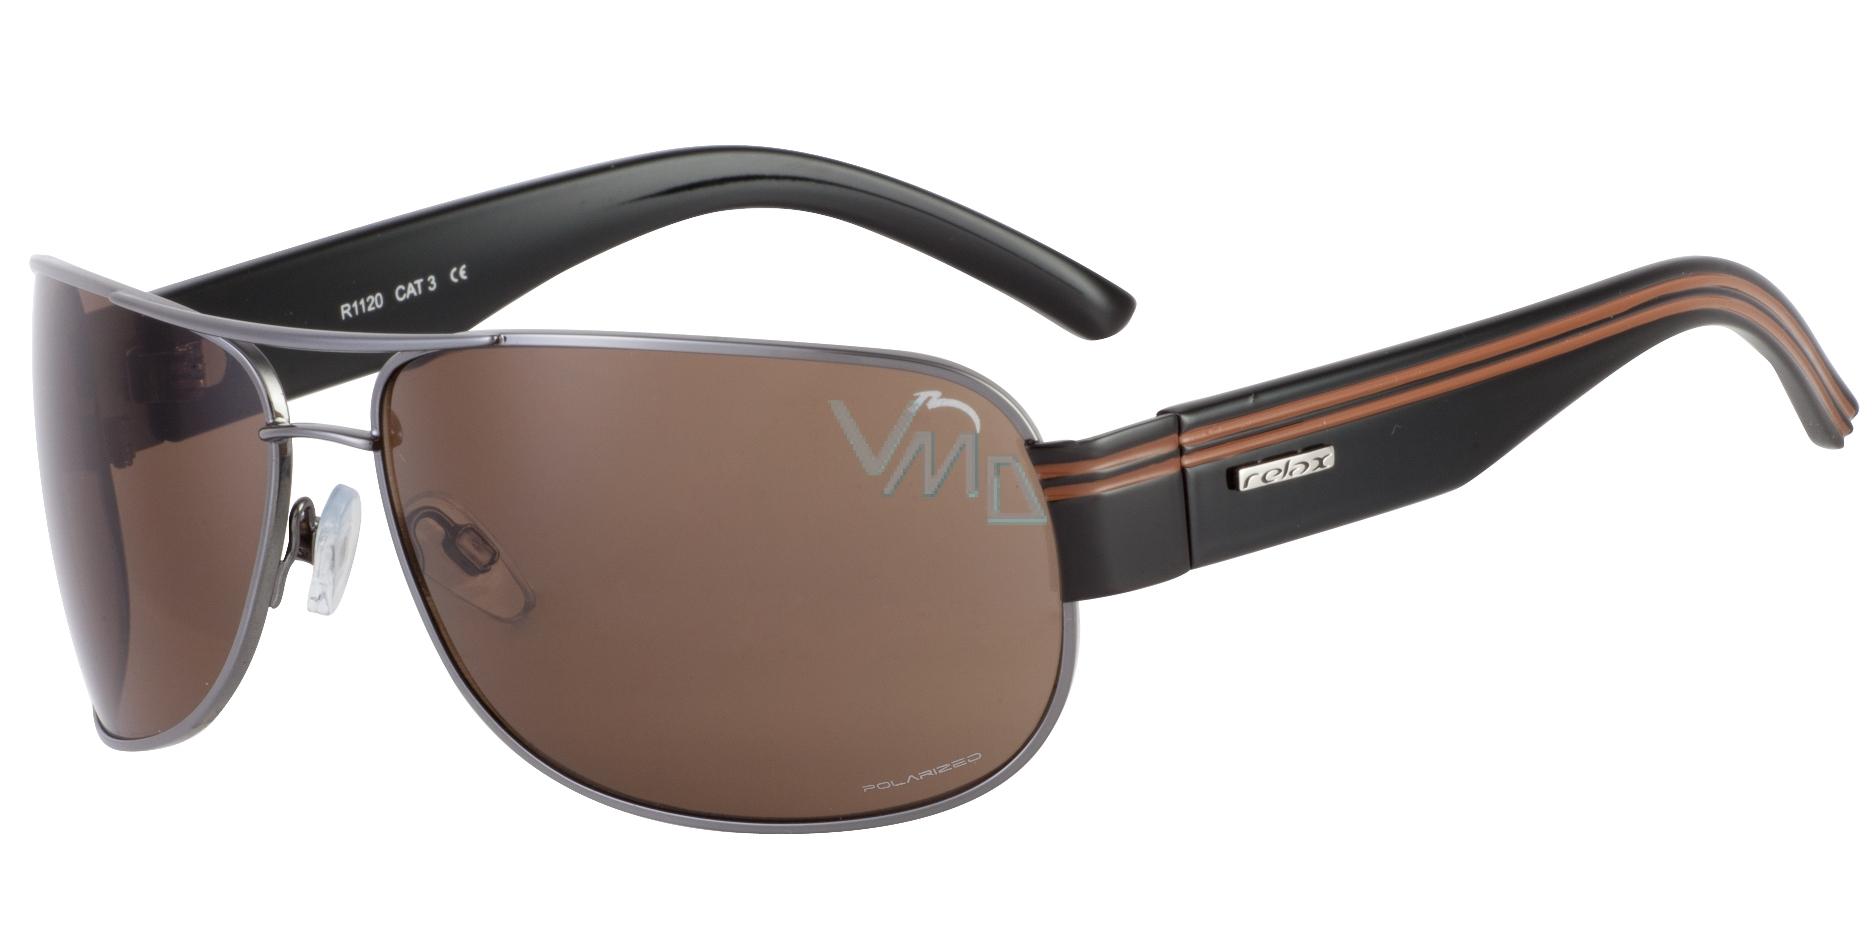 Relax Rhodus Sluneční brýle R1120 - VMD drogerie 709584d6345